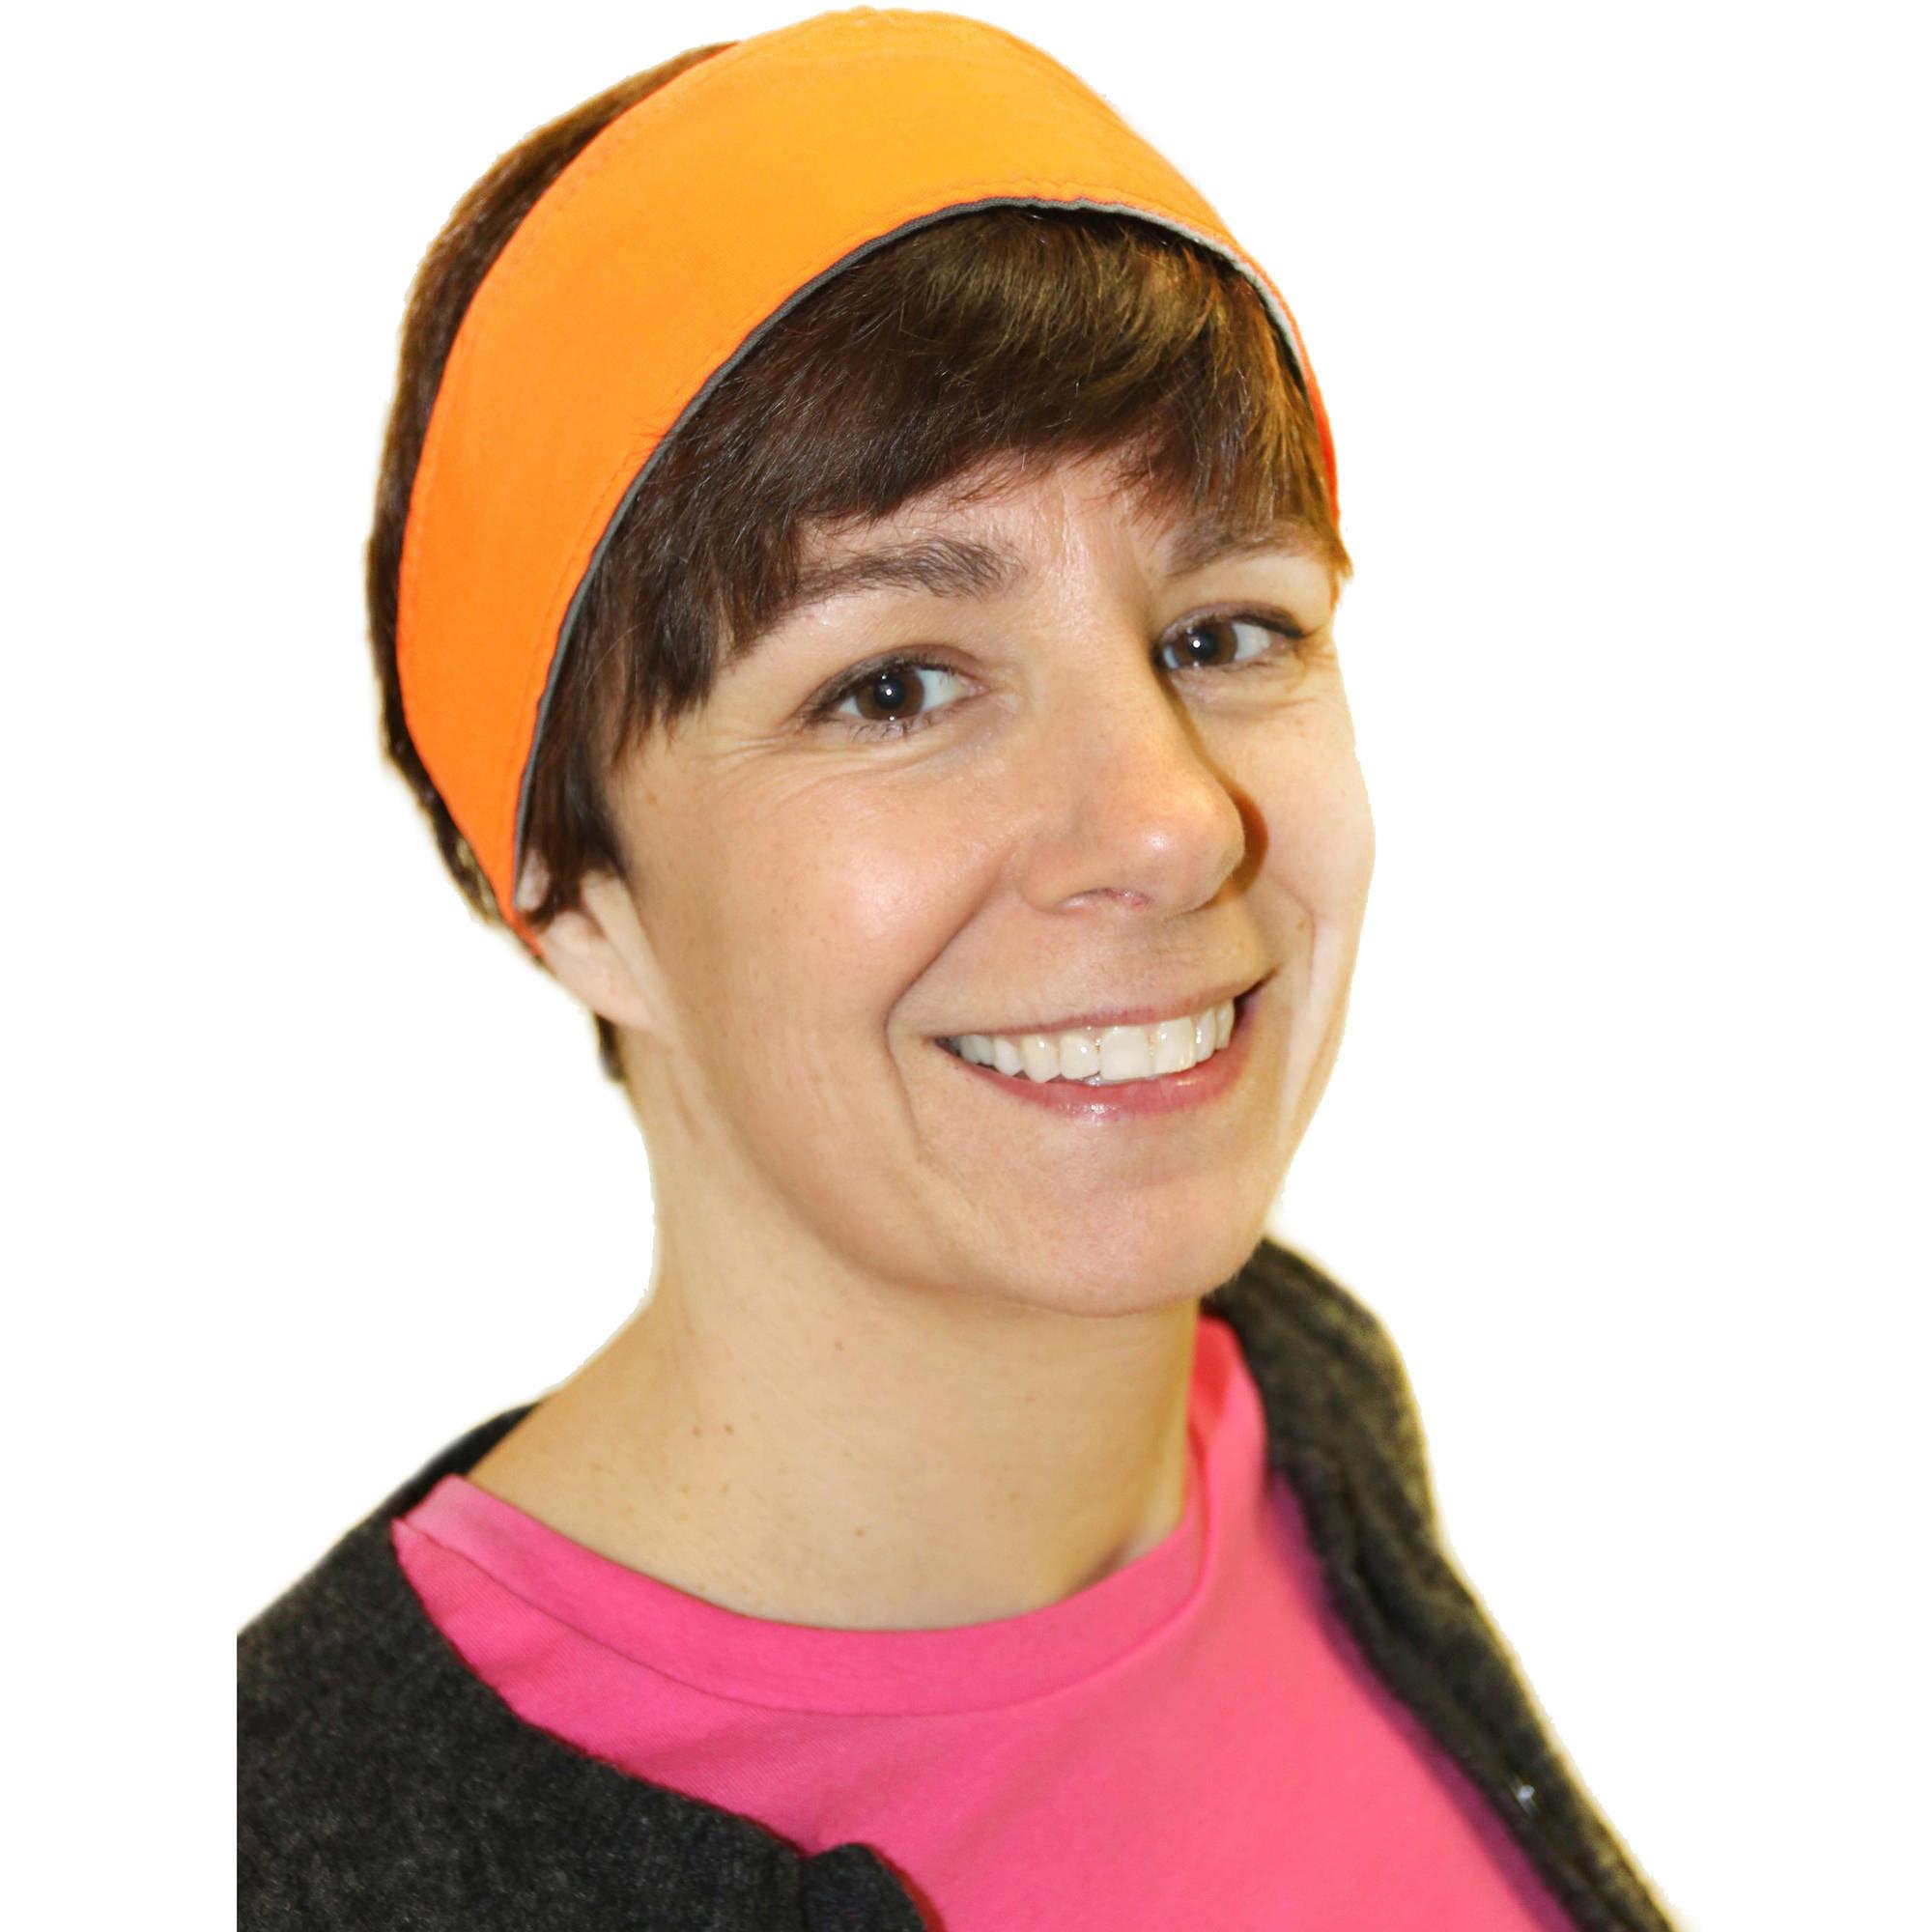 NFZ Reversible Headband, Blaze Orange